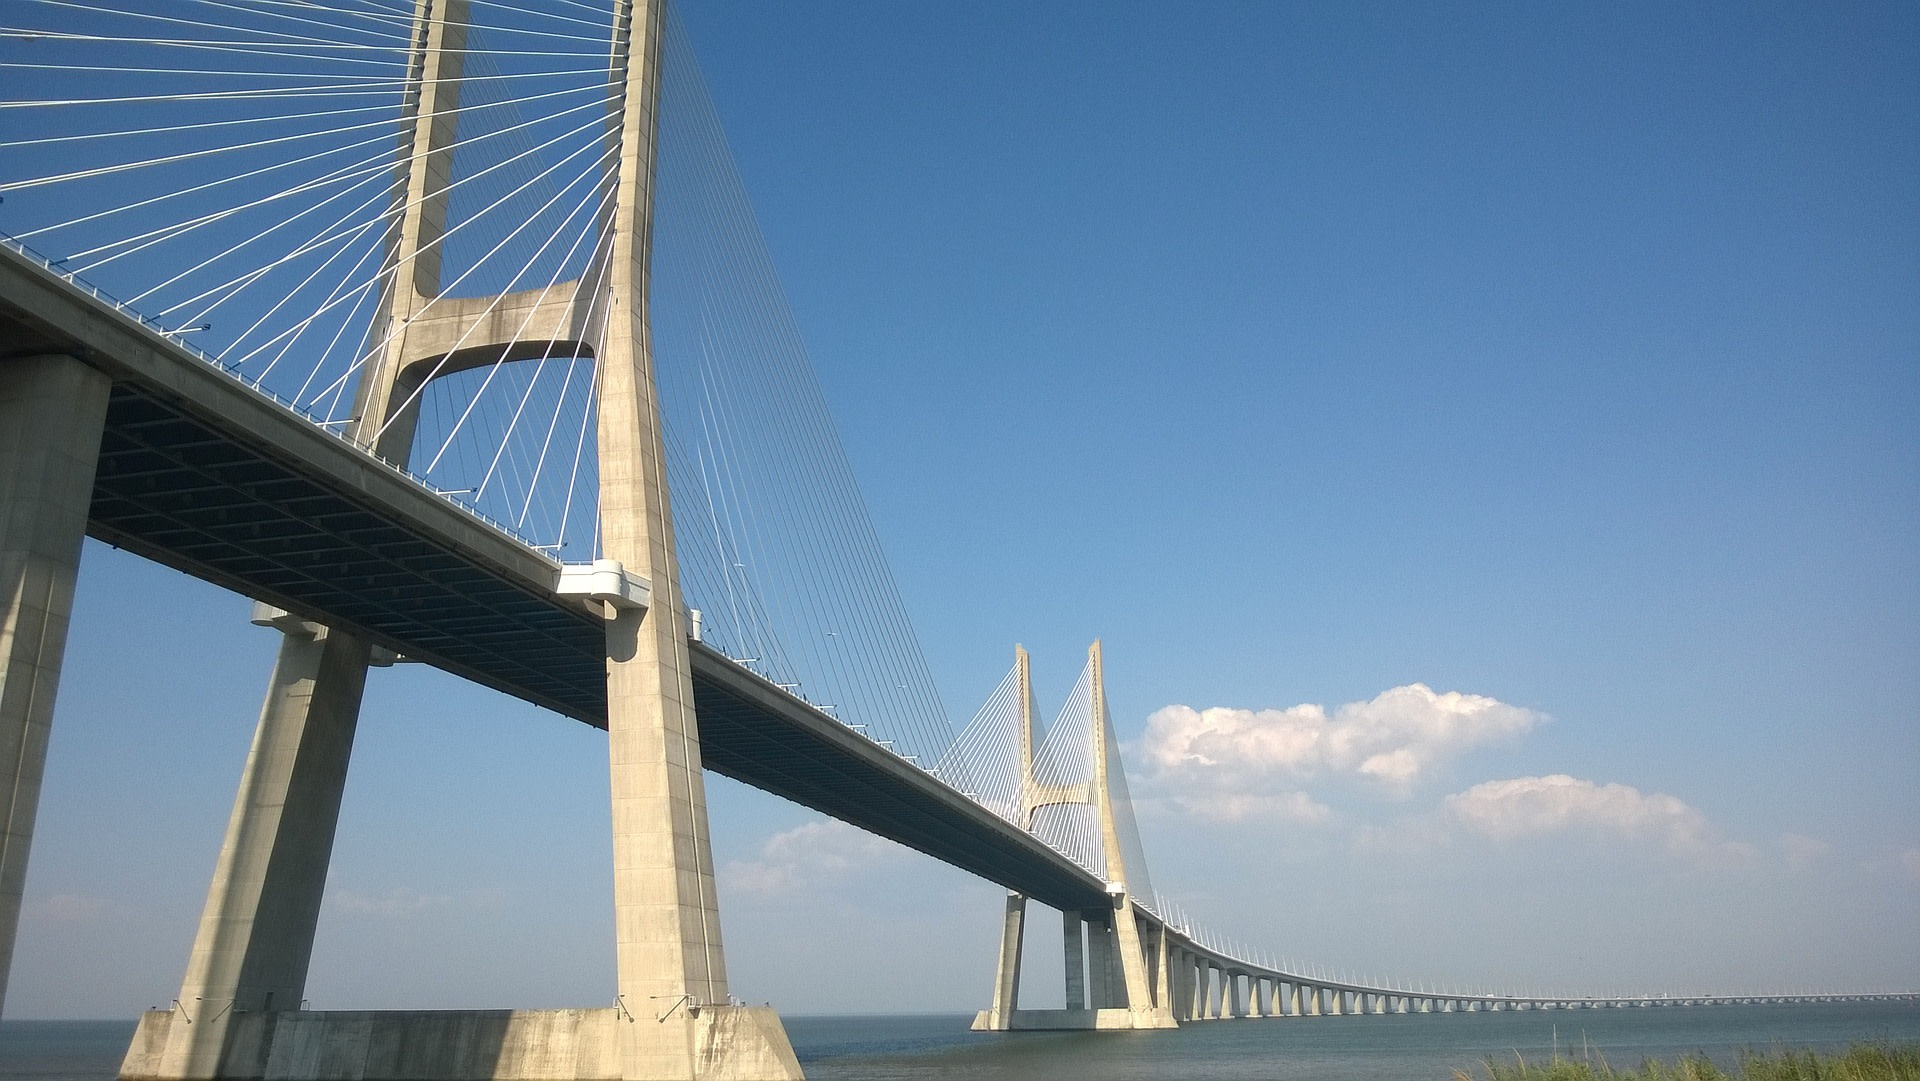 Il ponte Vasco da Gama